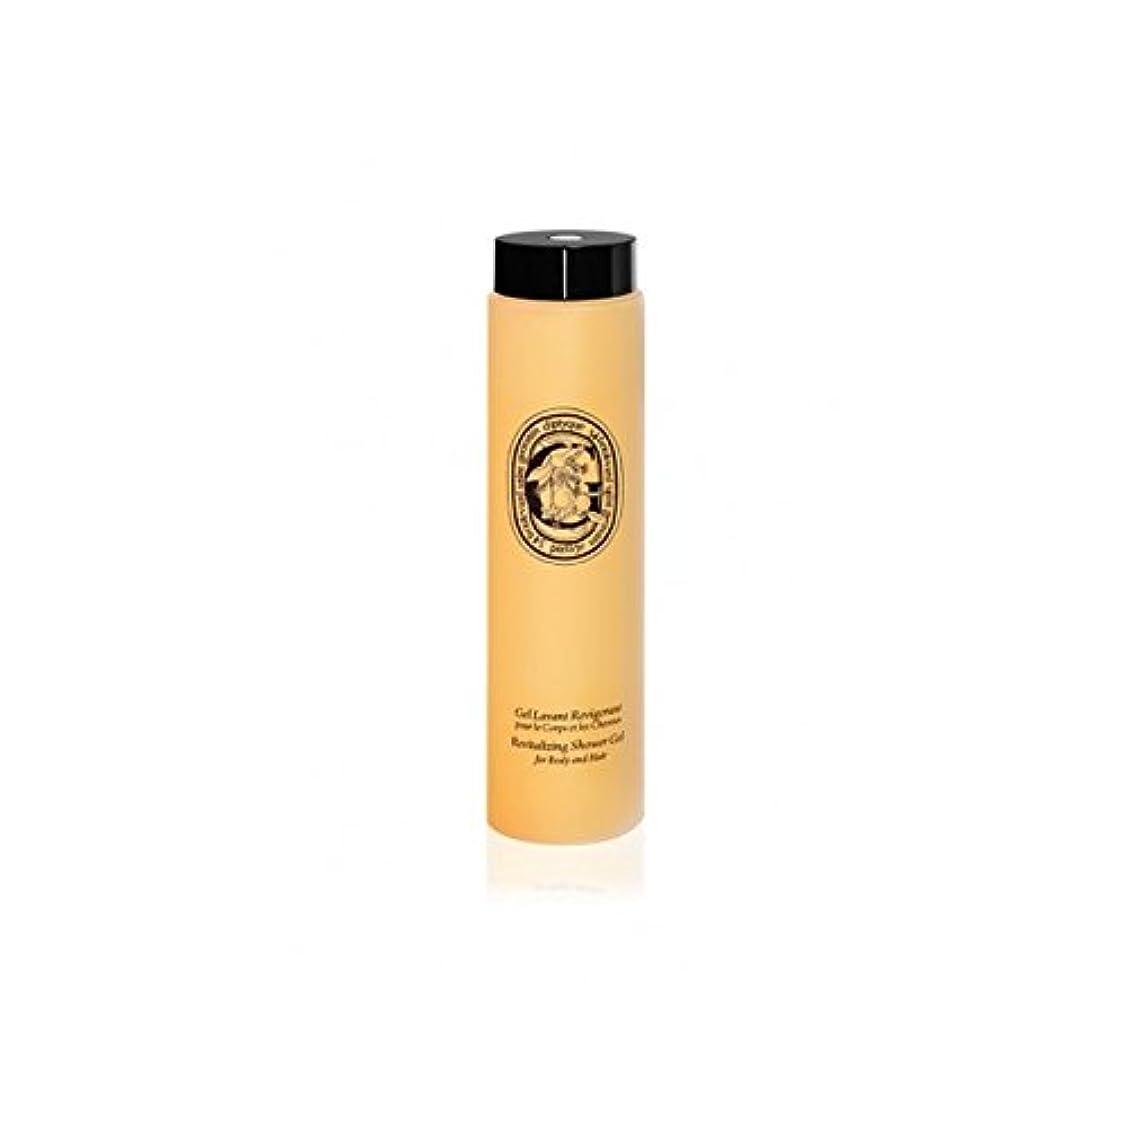 Diptyque Revitalizing Shower Gel For Body And Hair 200ml (Pack of 2) - ボディ、ヘア200ミリリットルのためDiptyqueのリバイタライジングシャワージェル...